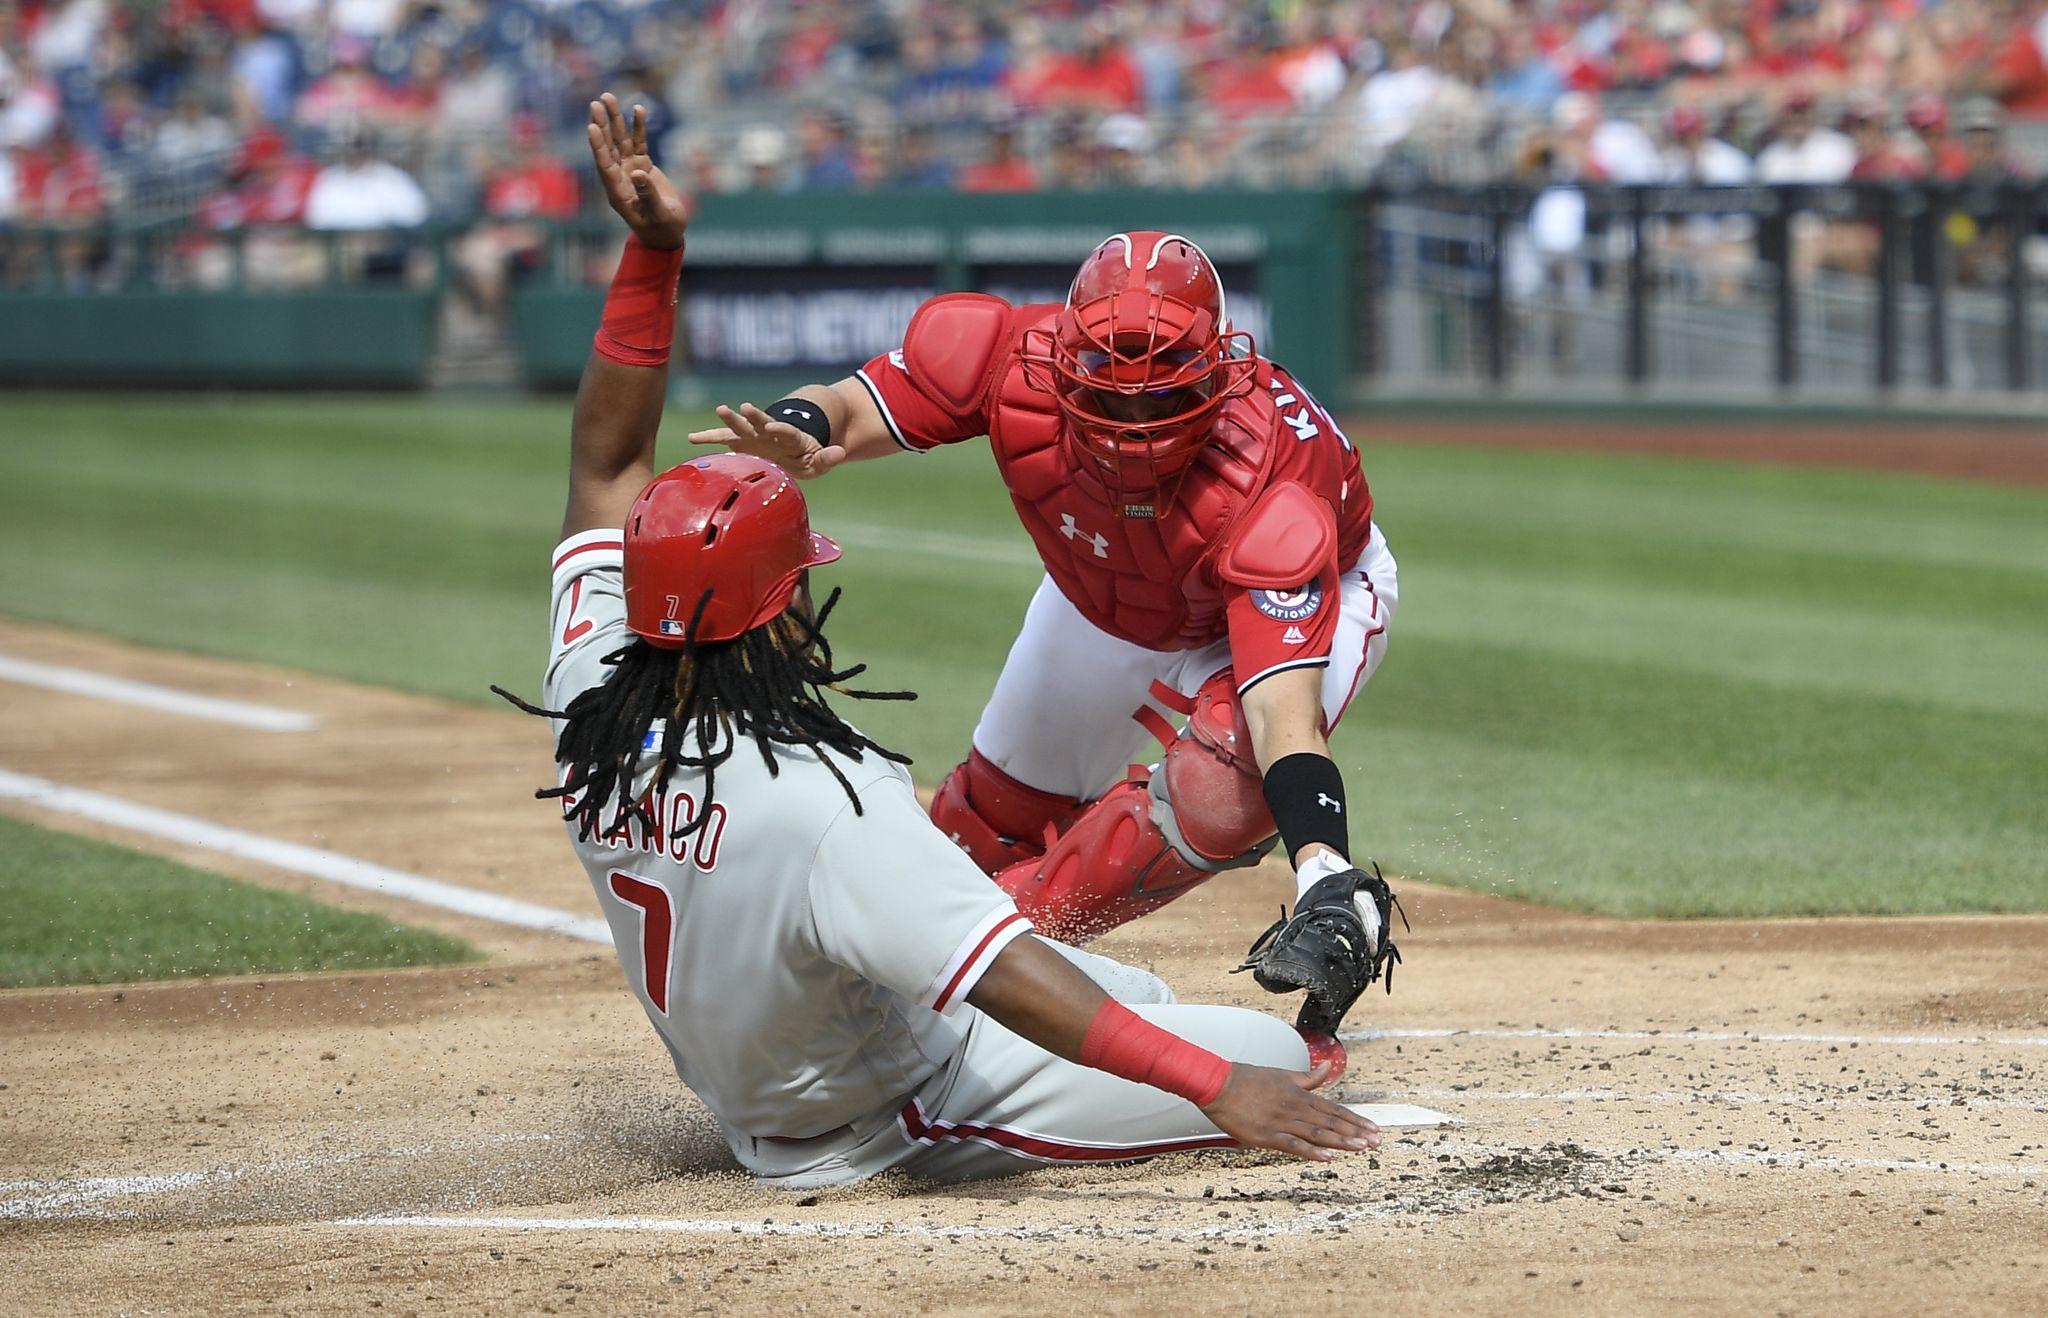 Phillies_nationals_baseball_57678.jpg-ac153_s2048x1318